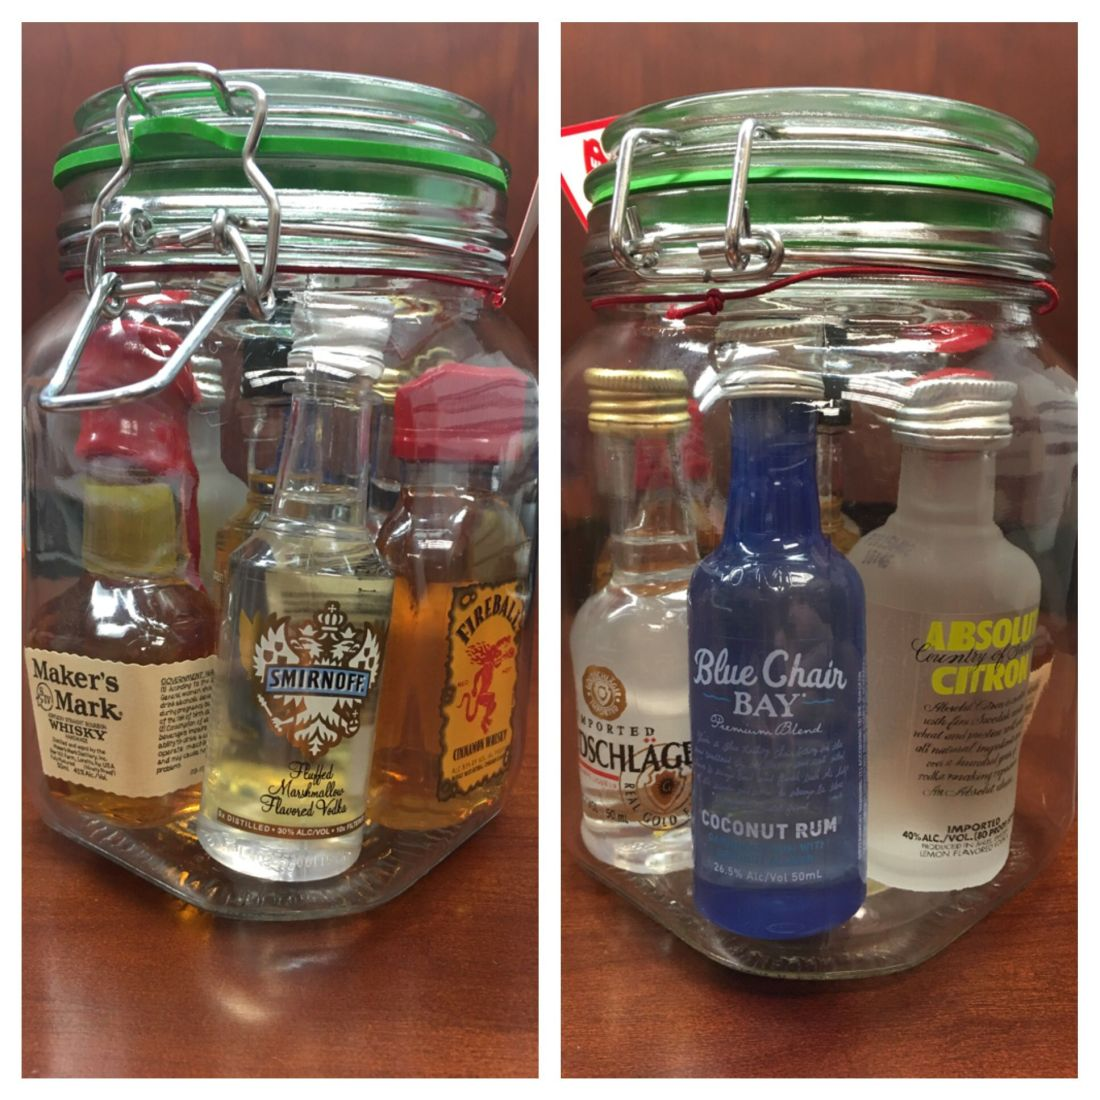 Minibar in a jar all for 20 jar 3ish at walmart